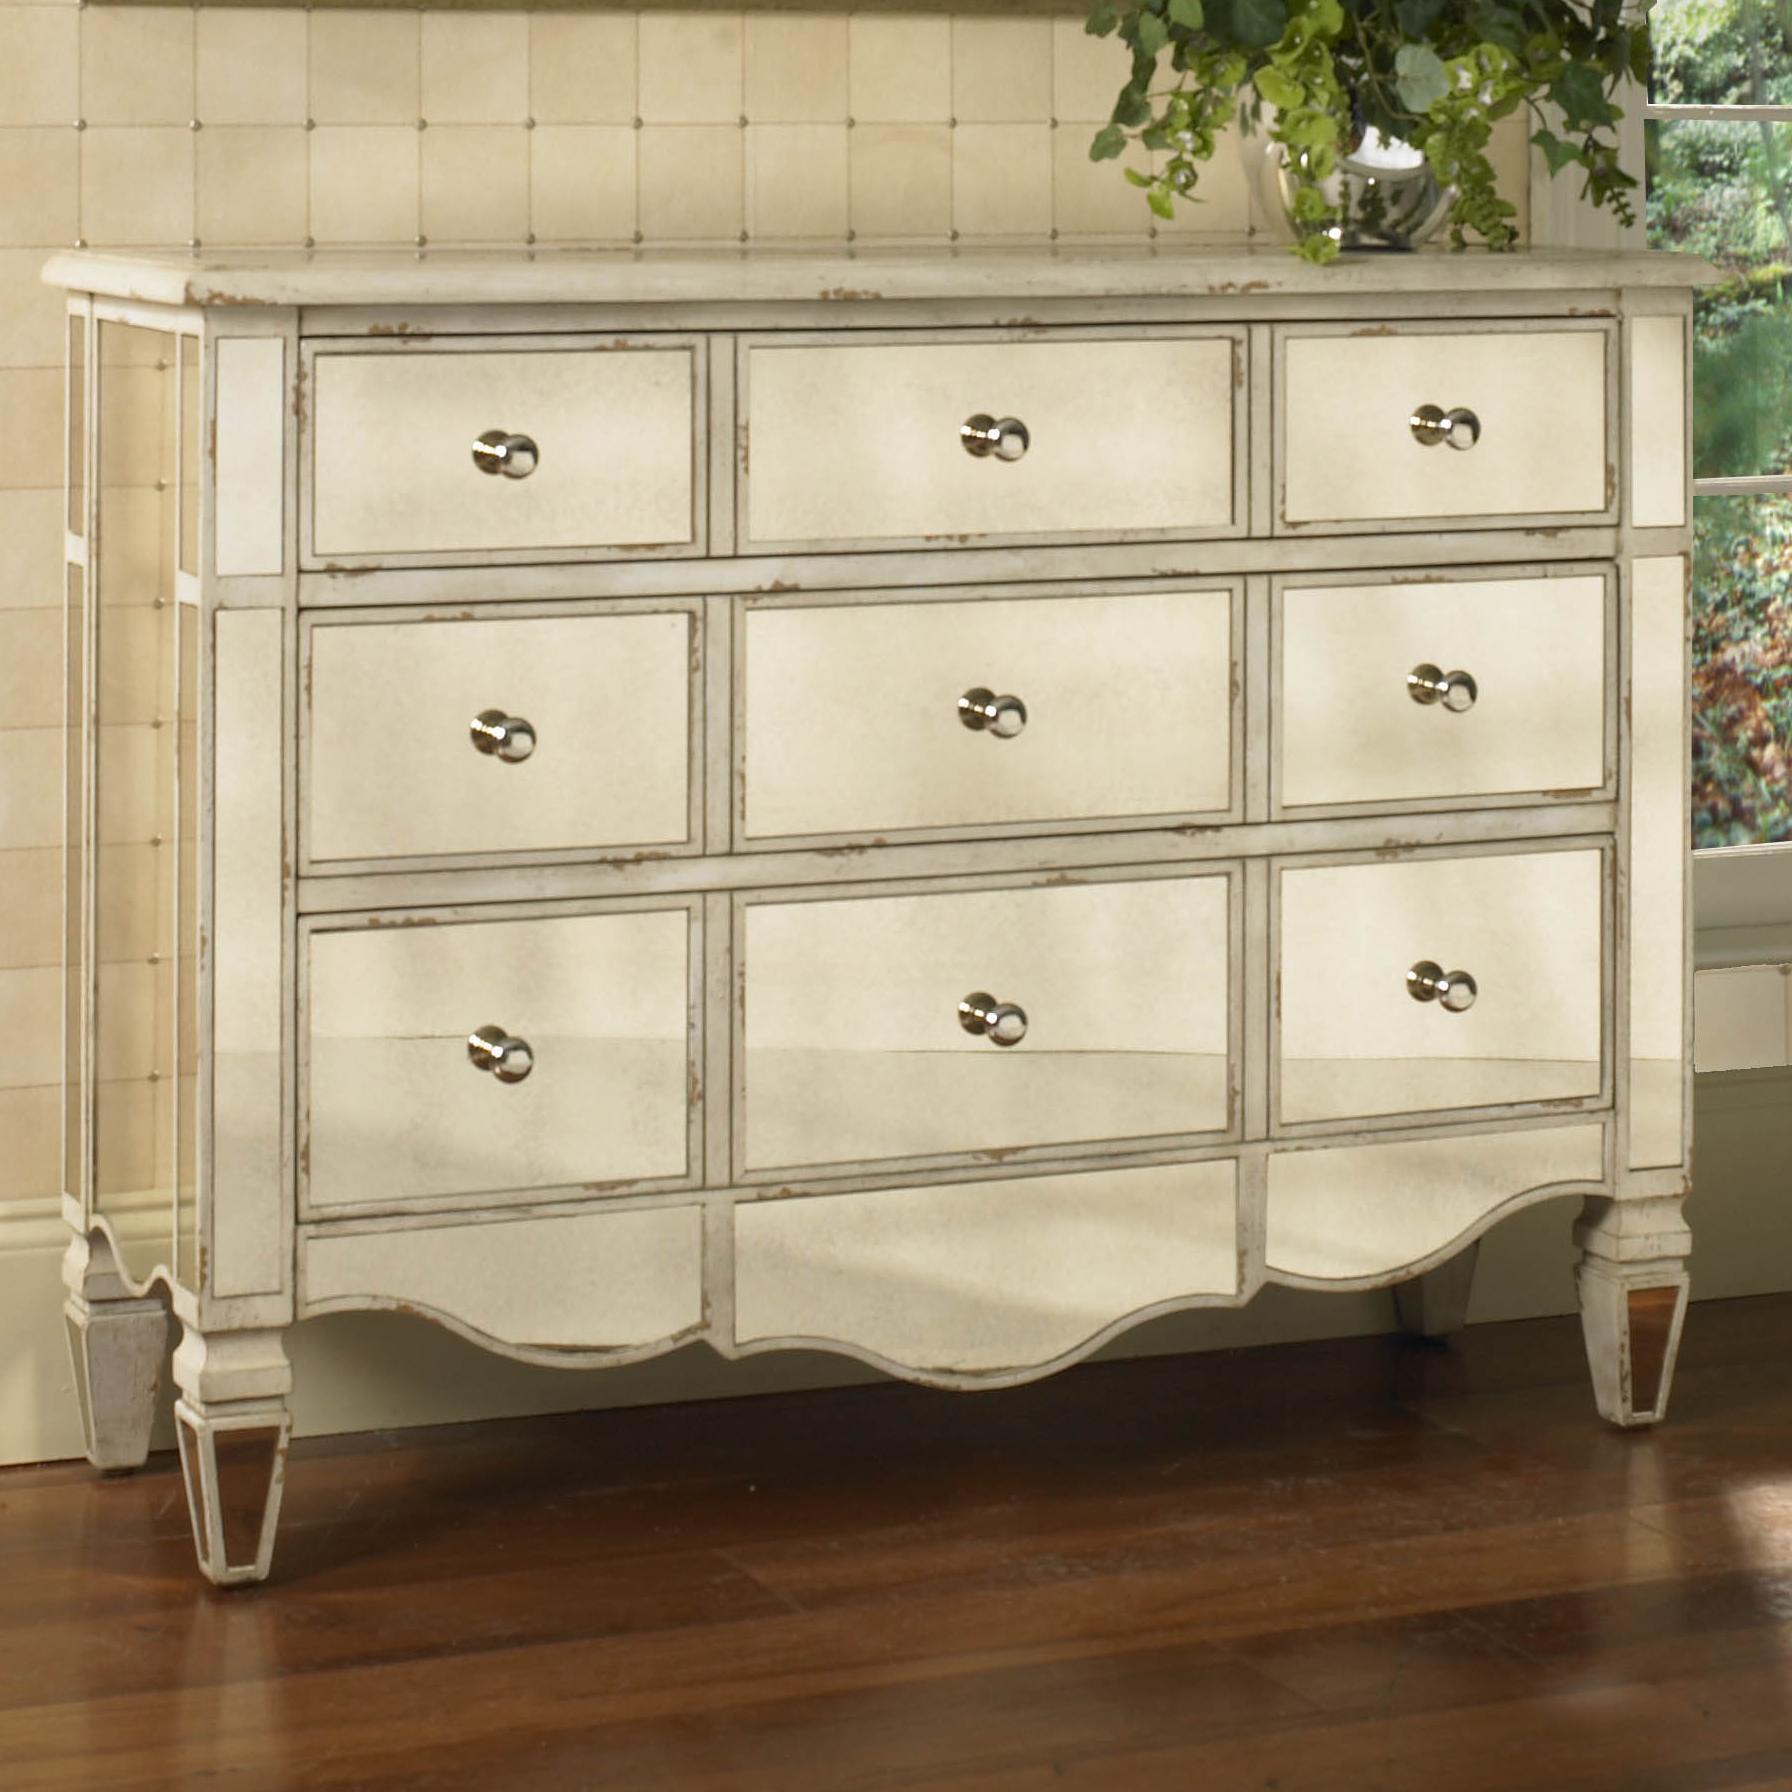 Pulaski Furniture Accents Accent Chest - Item Number: 739349